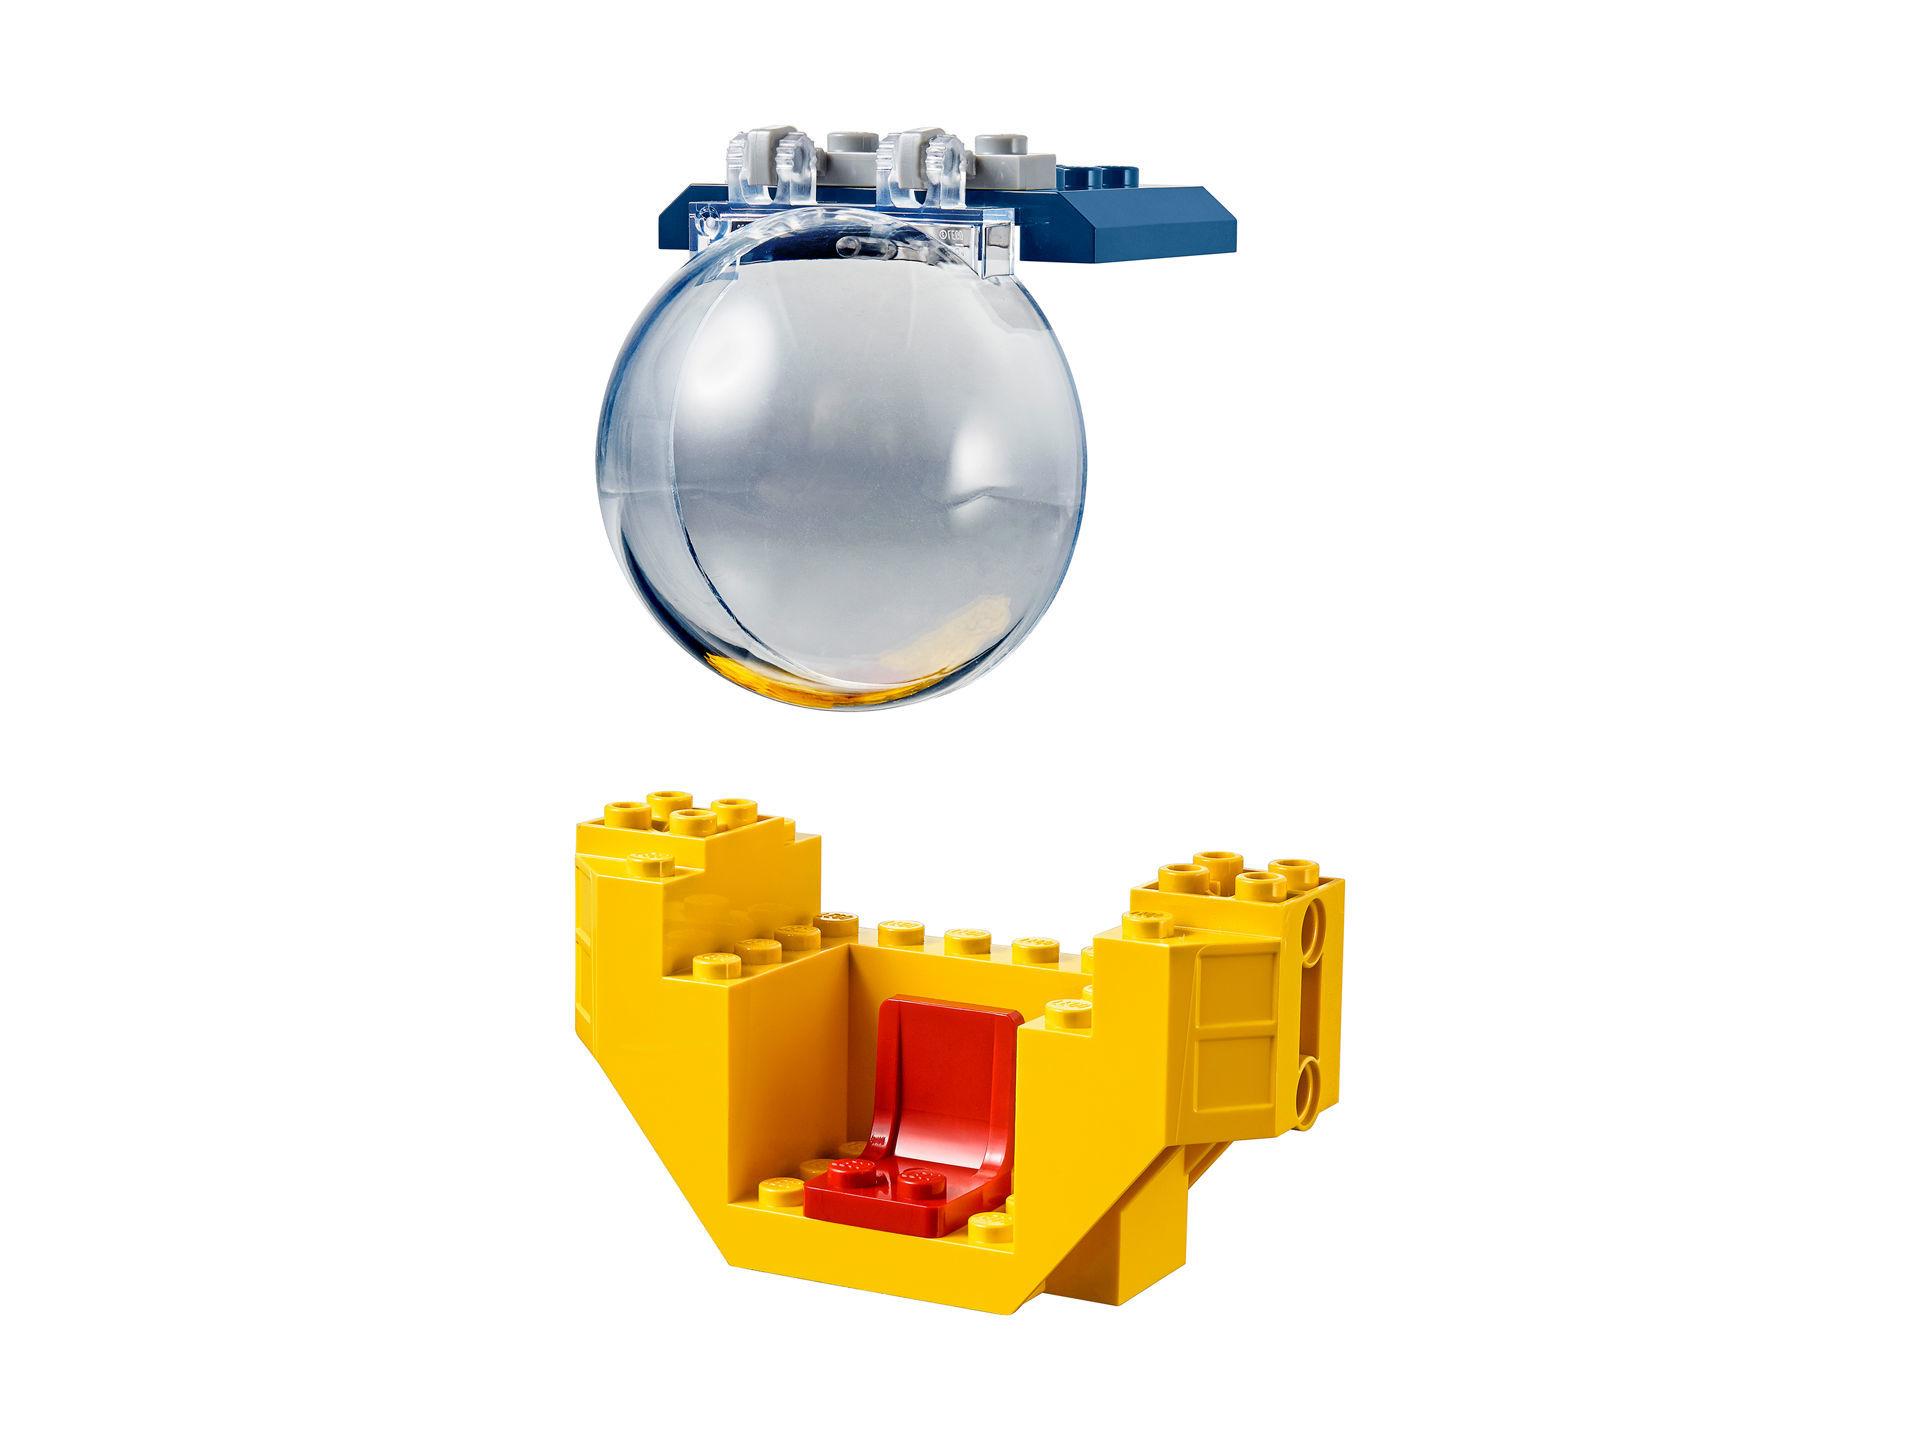 Lego City - Mini Submarine 60263